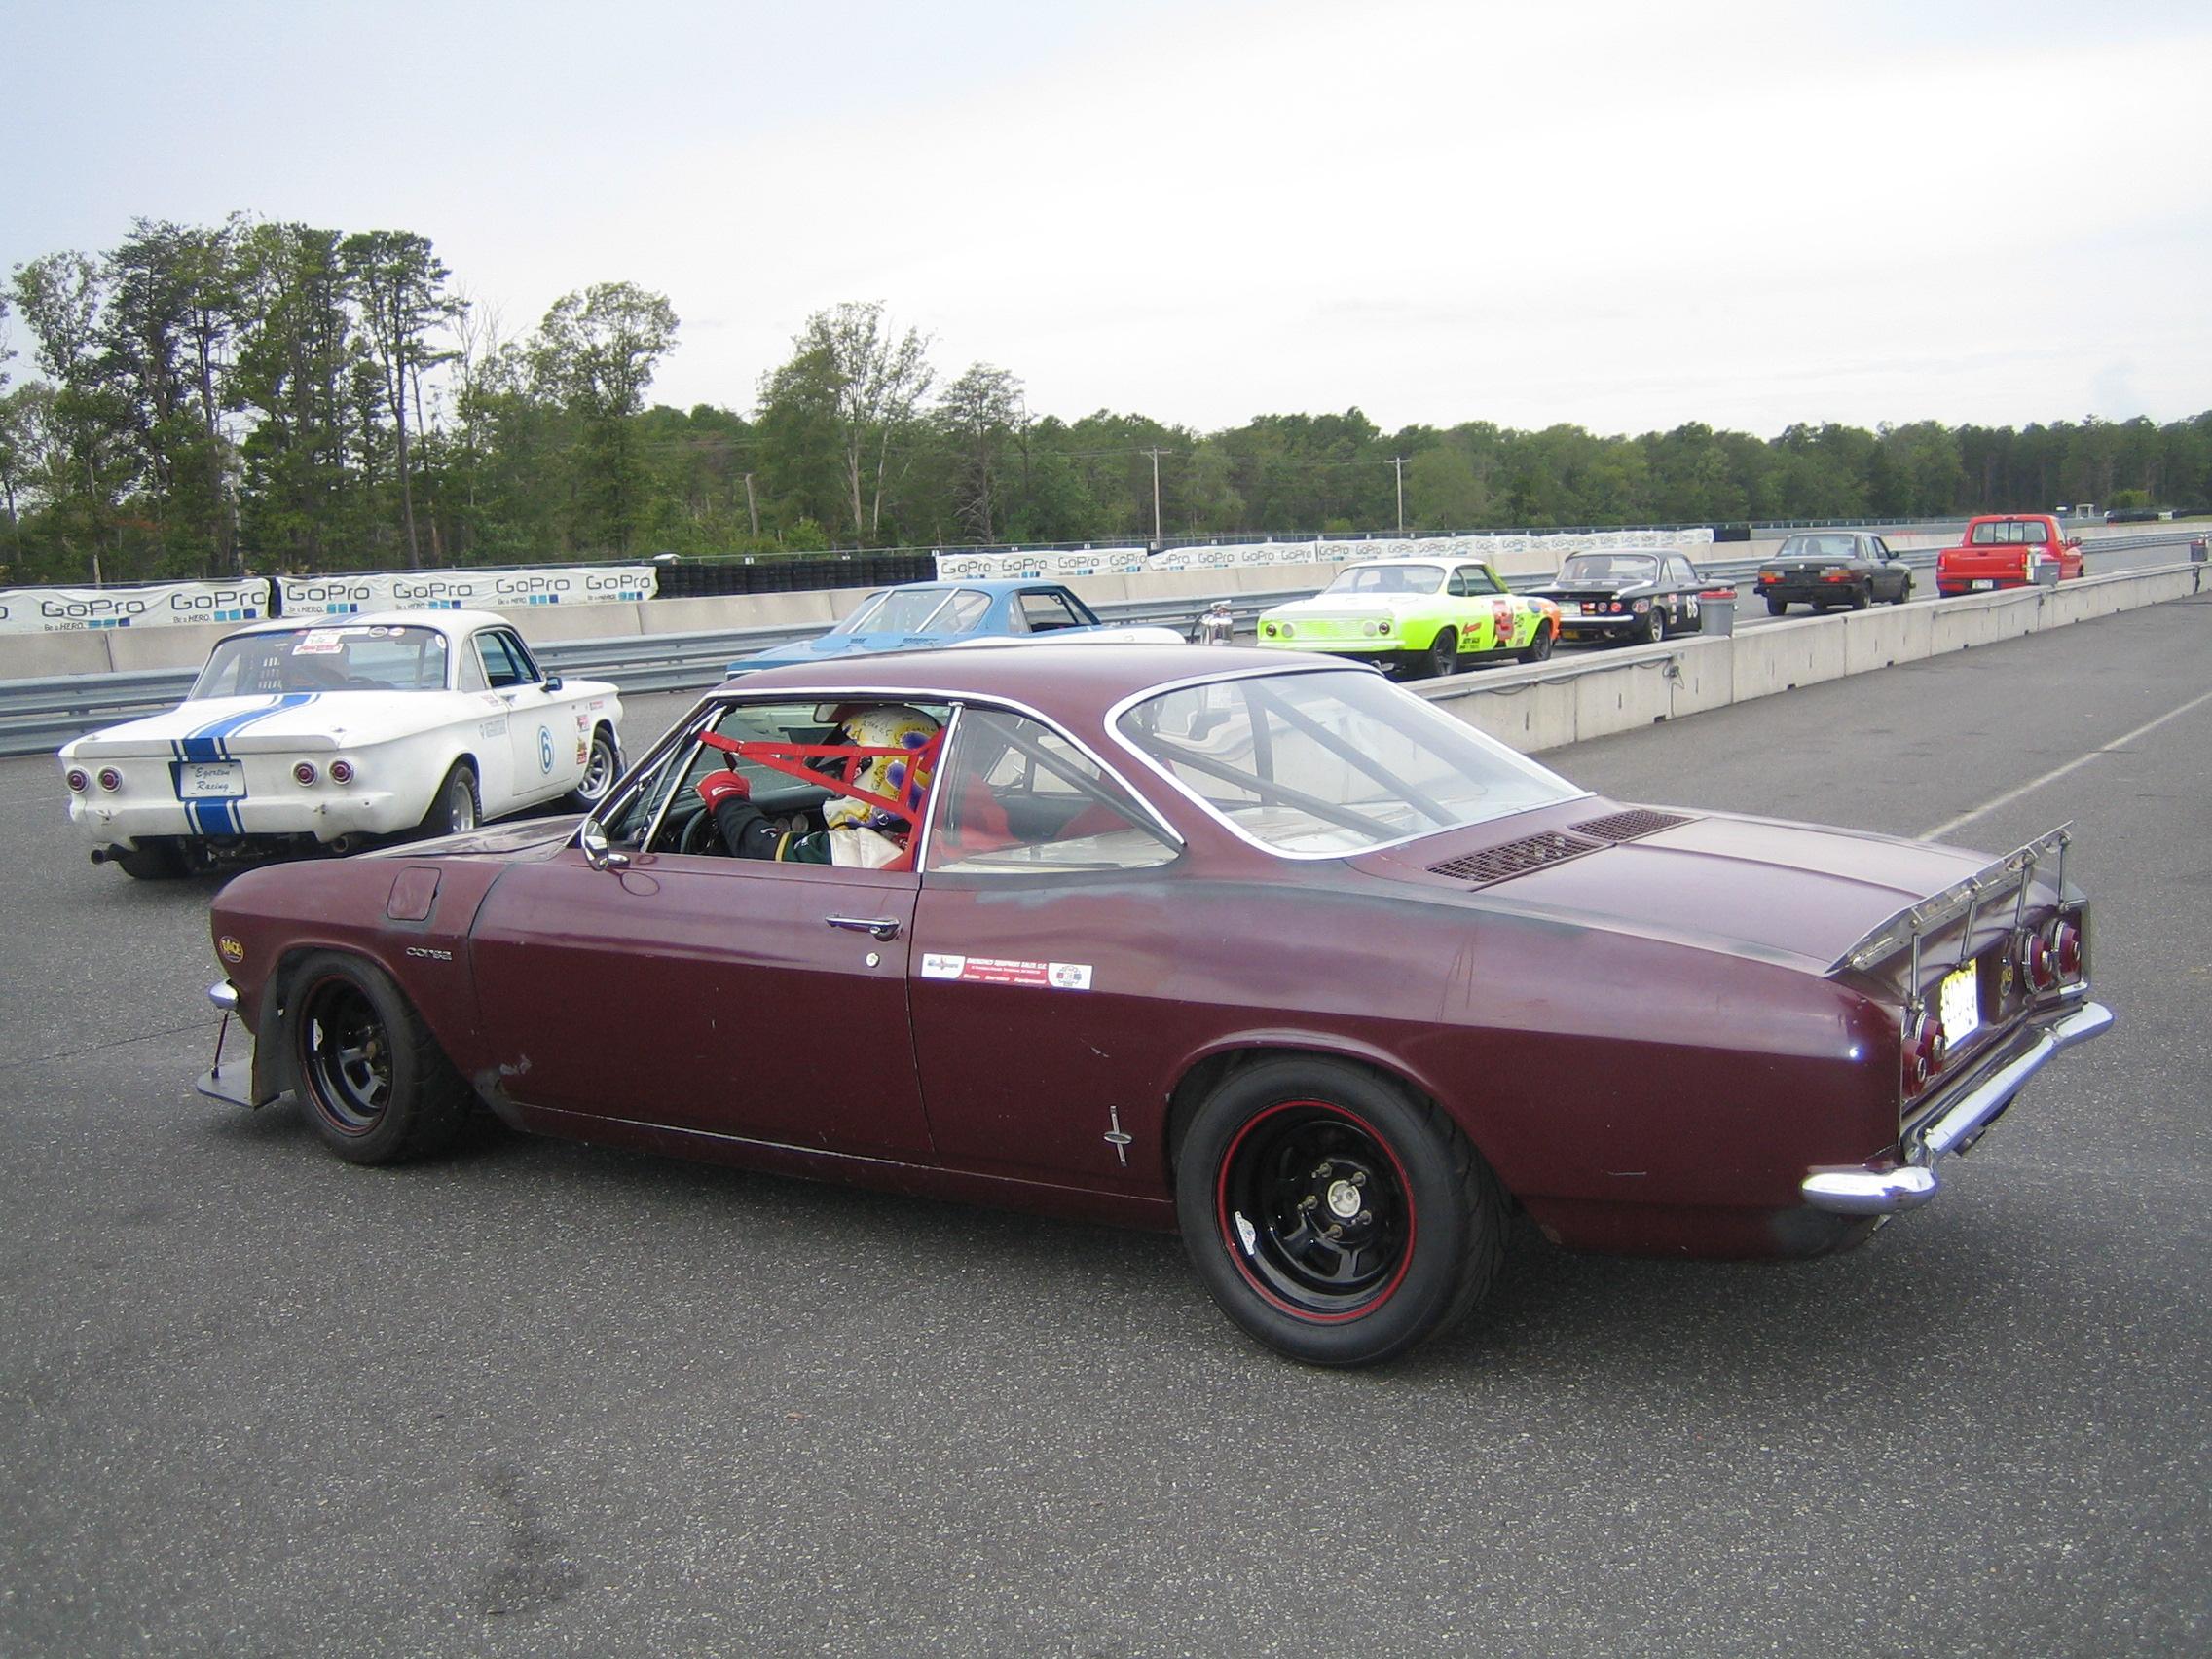 Necc Photos New Jersey Motorsports Park Thunderbolt 2014